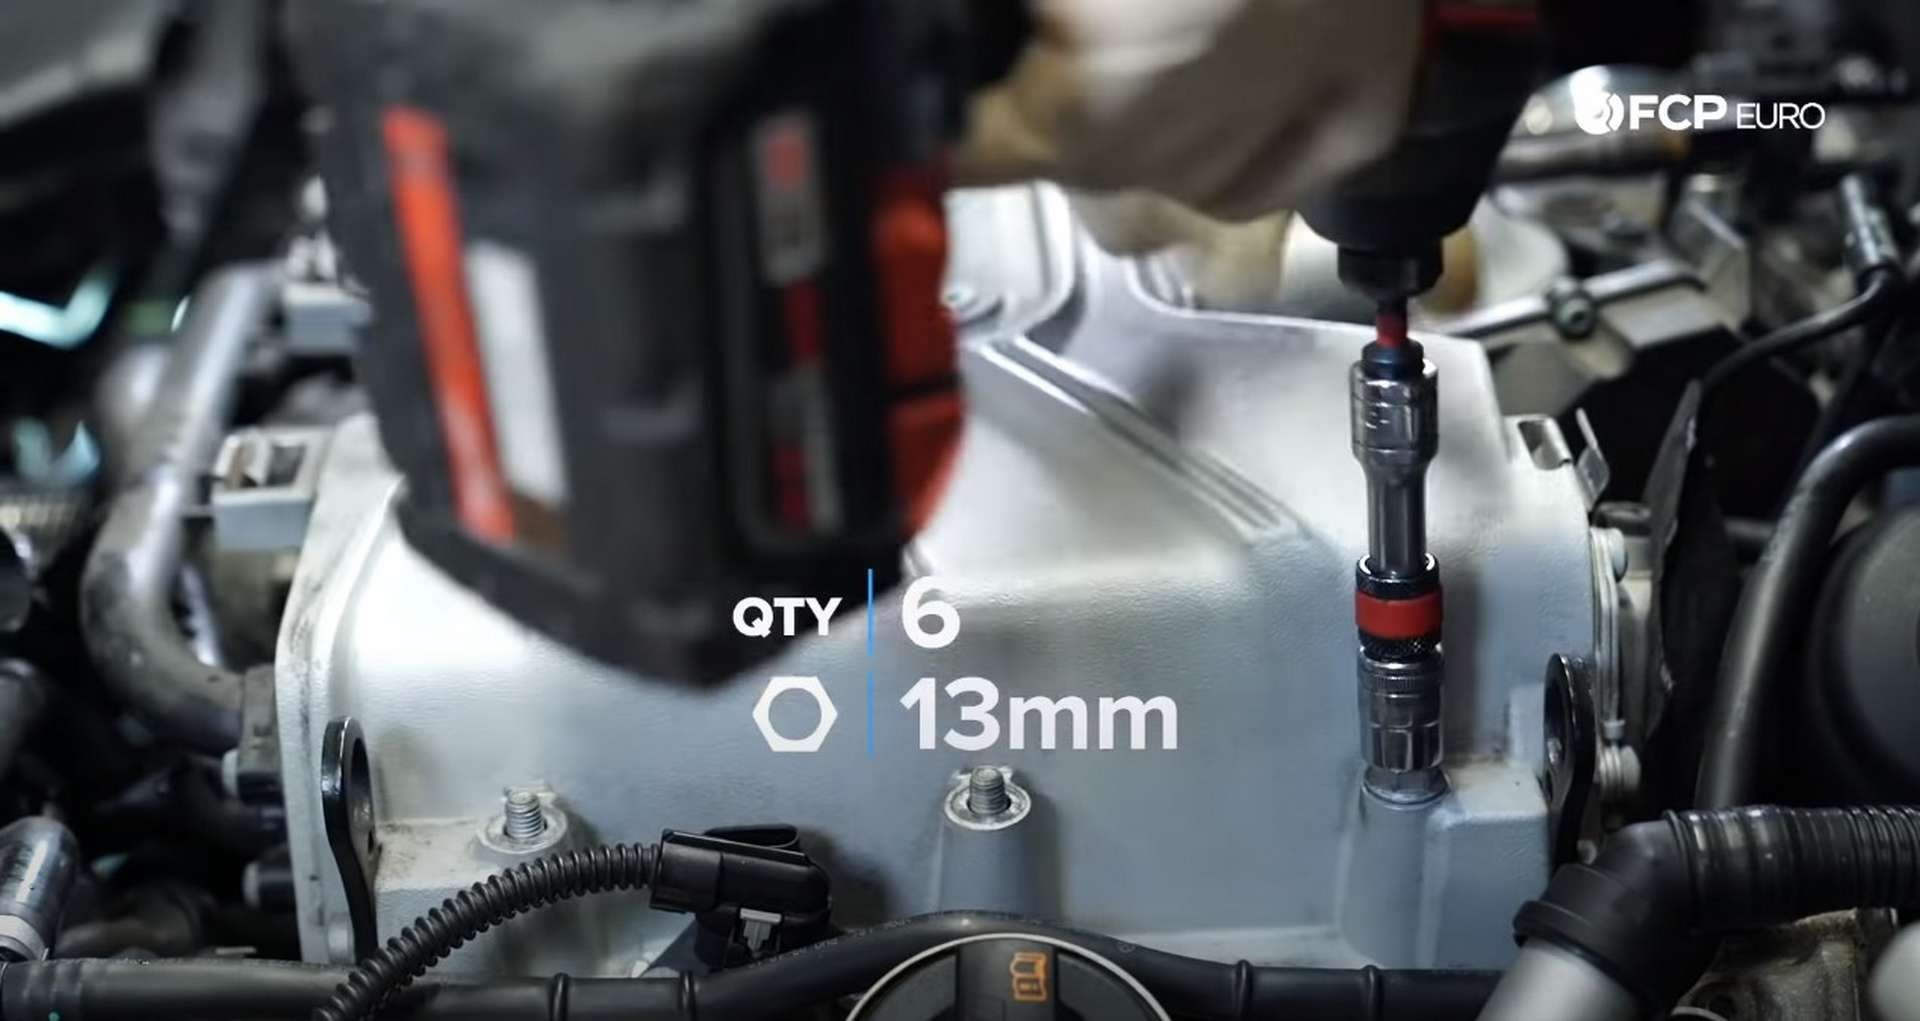 DIY Audi 3.0t Walnut Blasting Intake Valves removing the supercharger nuts